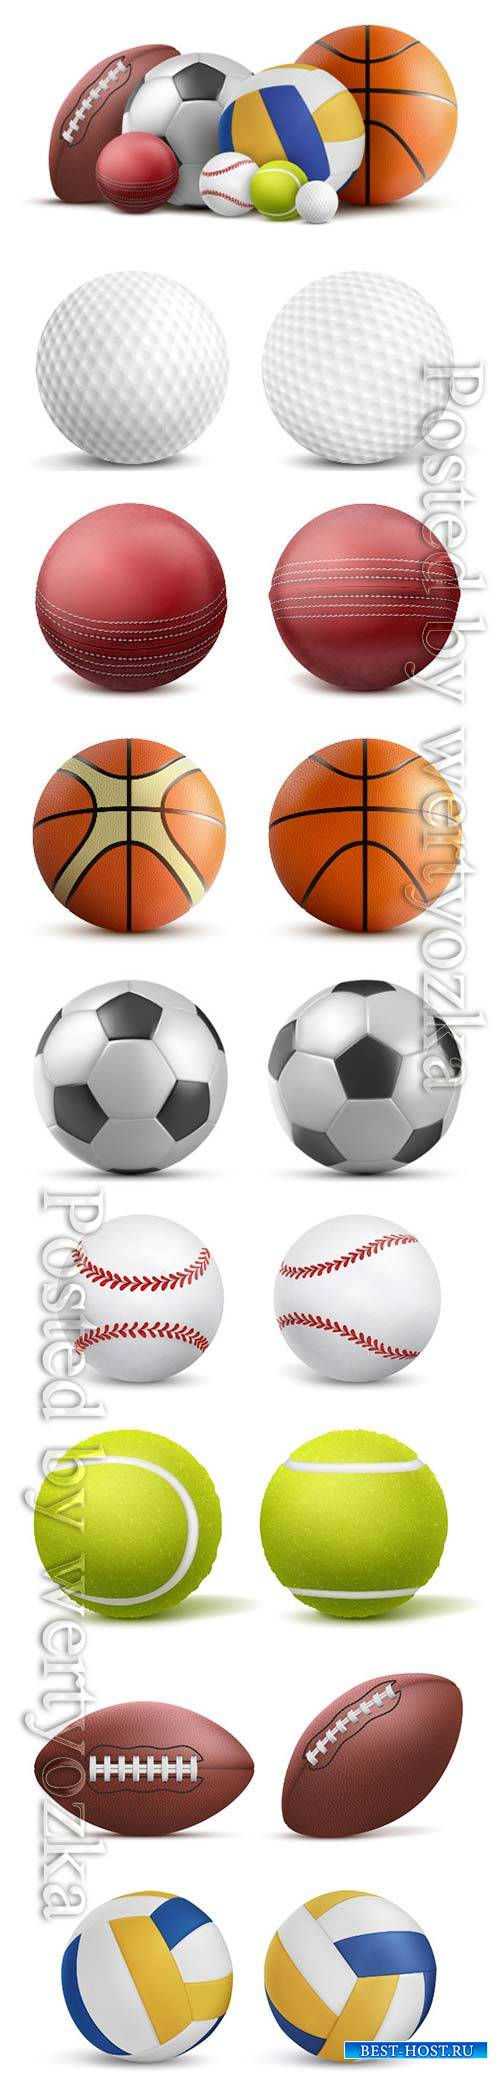 Sports balls, soccer, volleyball, baseball, tennis, golf, rugby vector temp ...